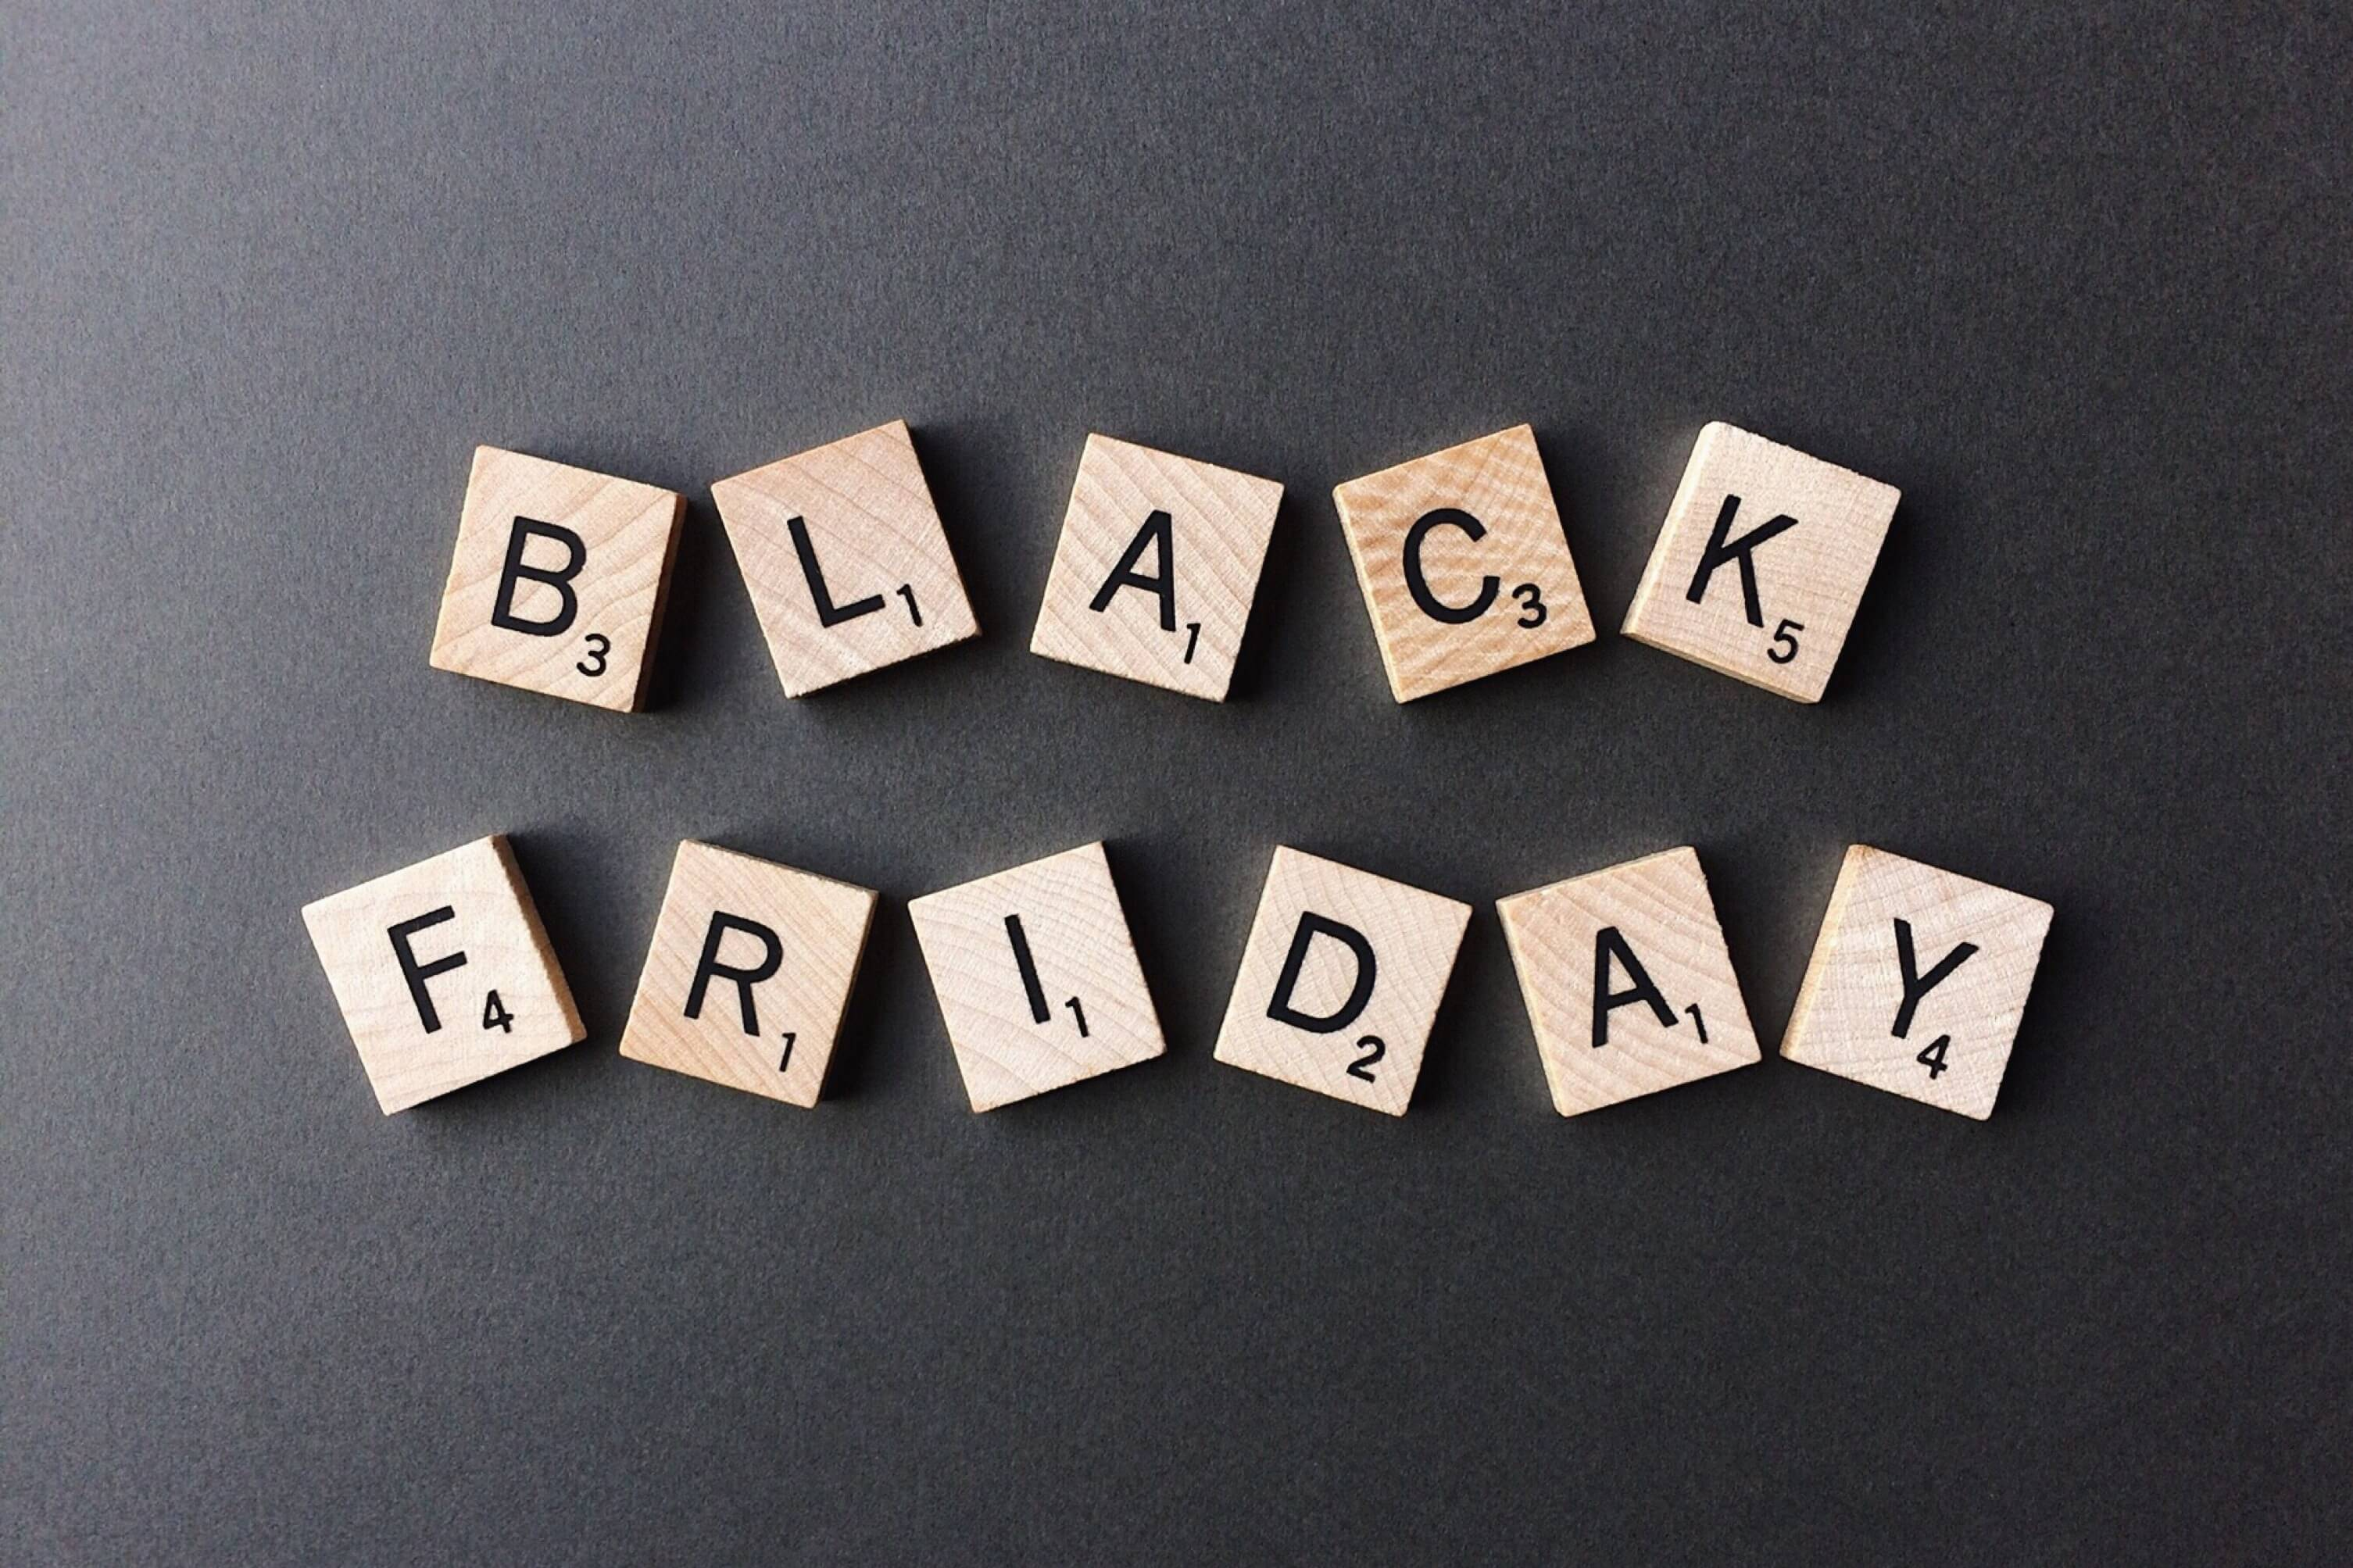 Black Friday e as ofertas fraudulentas via WhatsApp